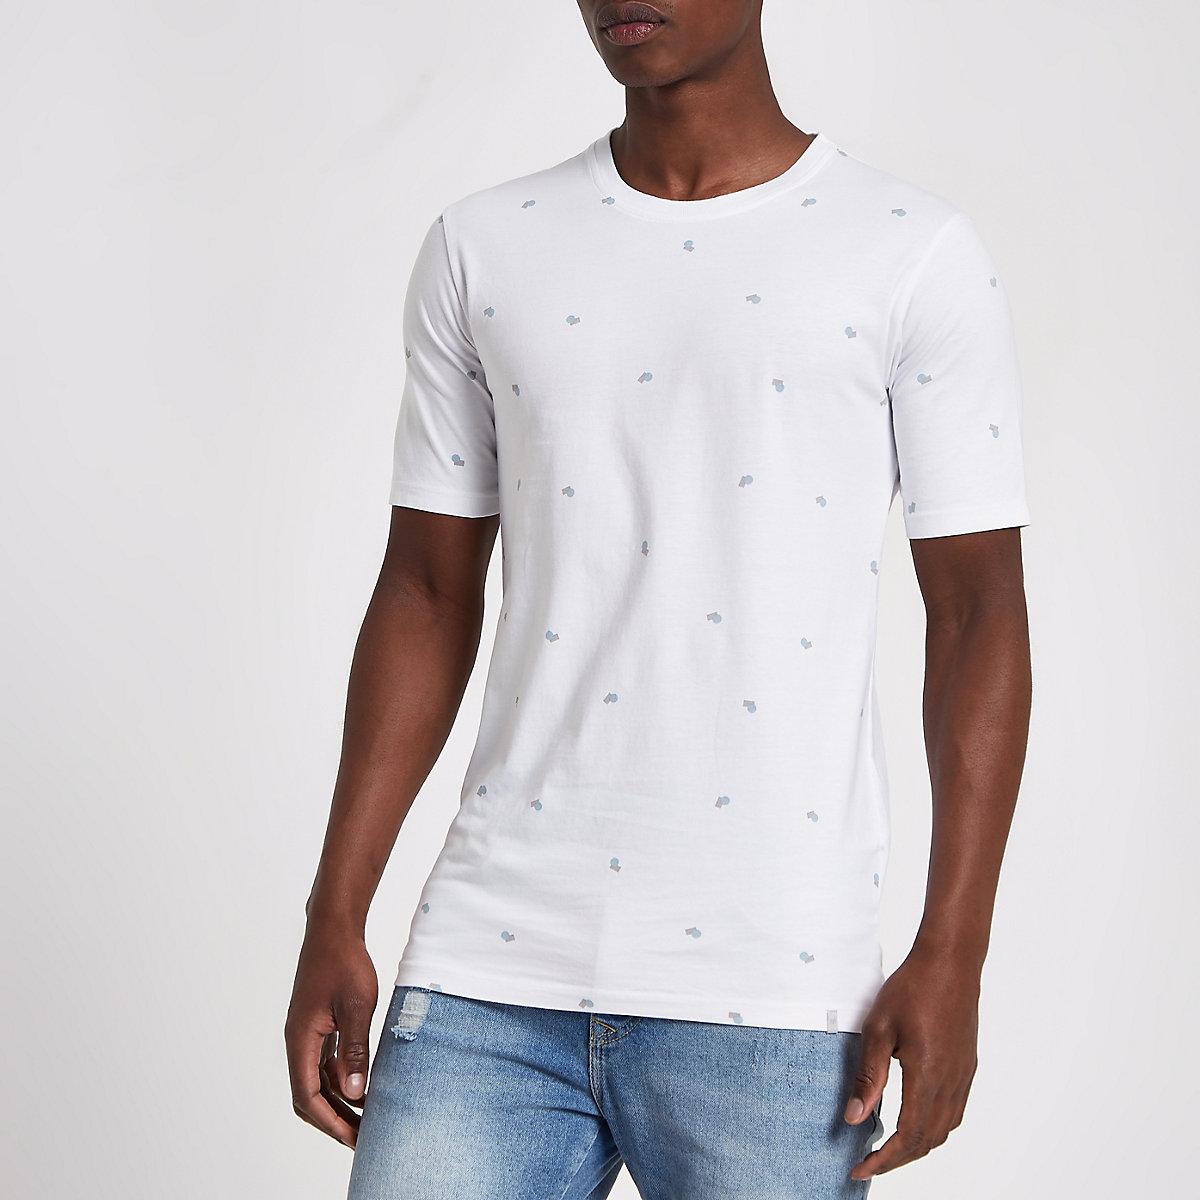 Minimum white print T-shirt